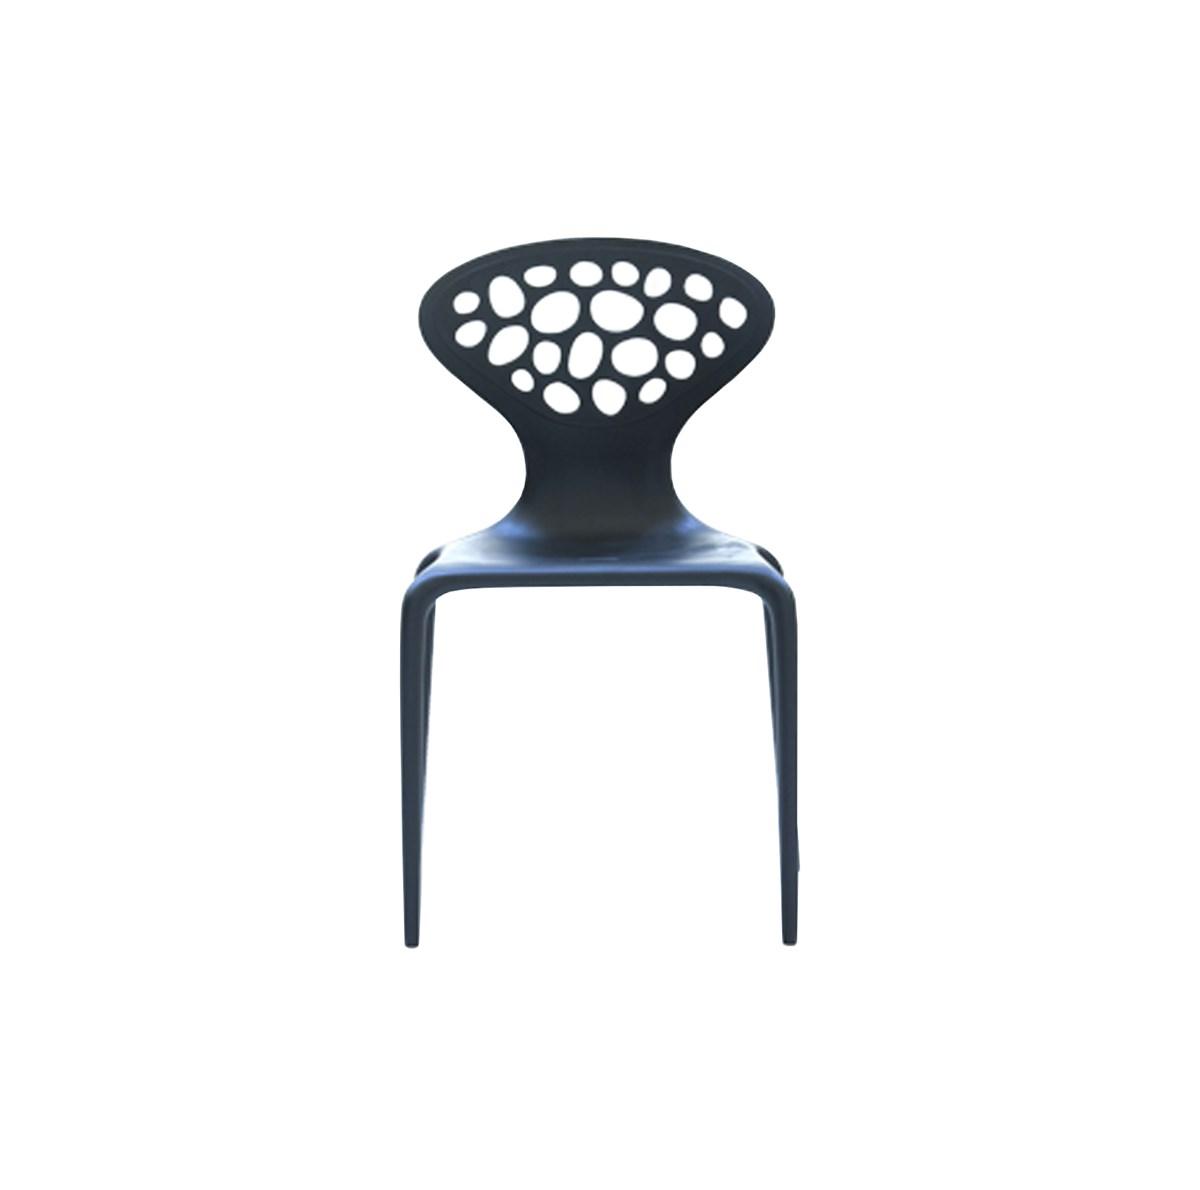 Moroso-Ross-Lovegrove-Supernatural-Chair-Matisse-1